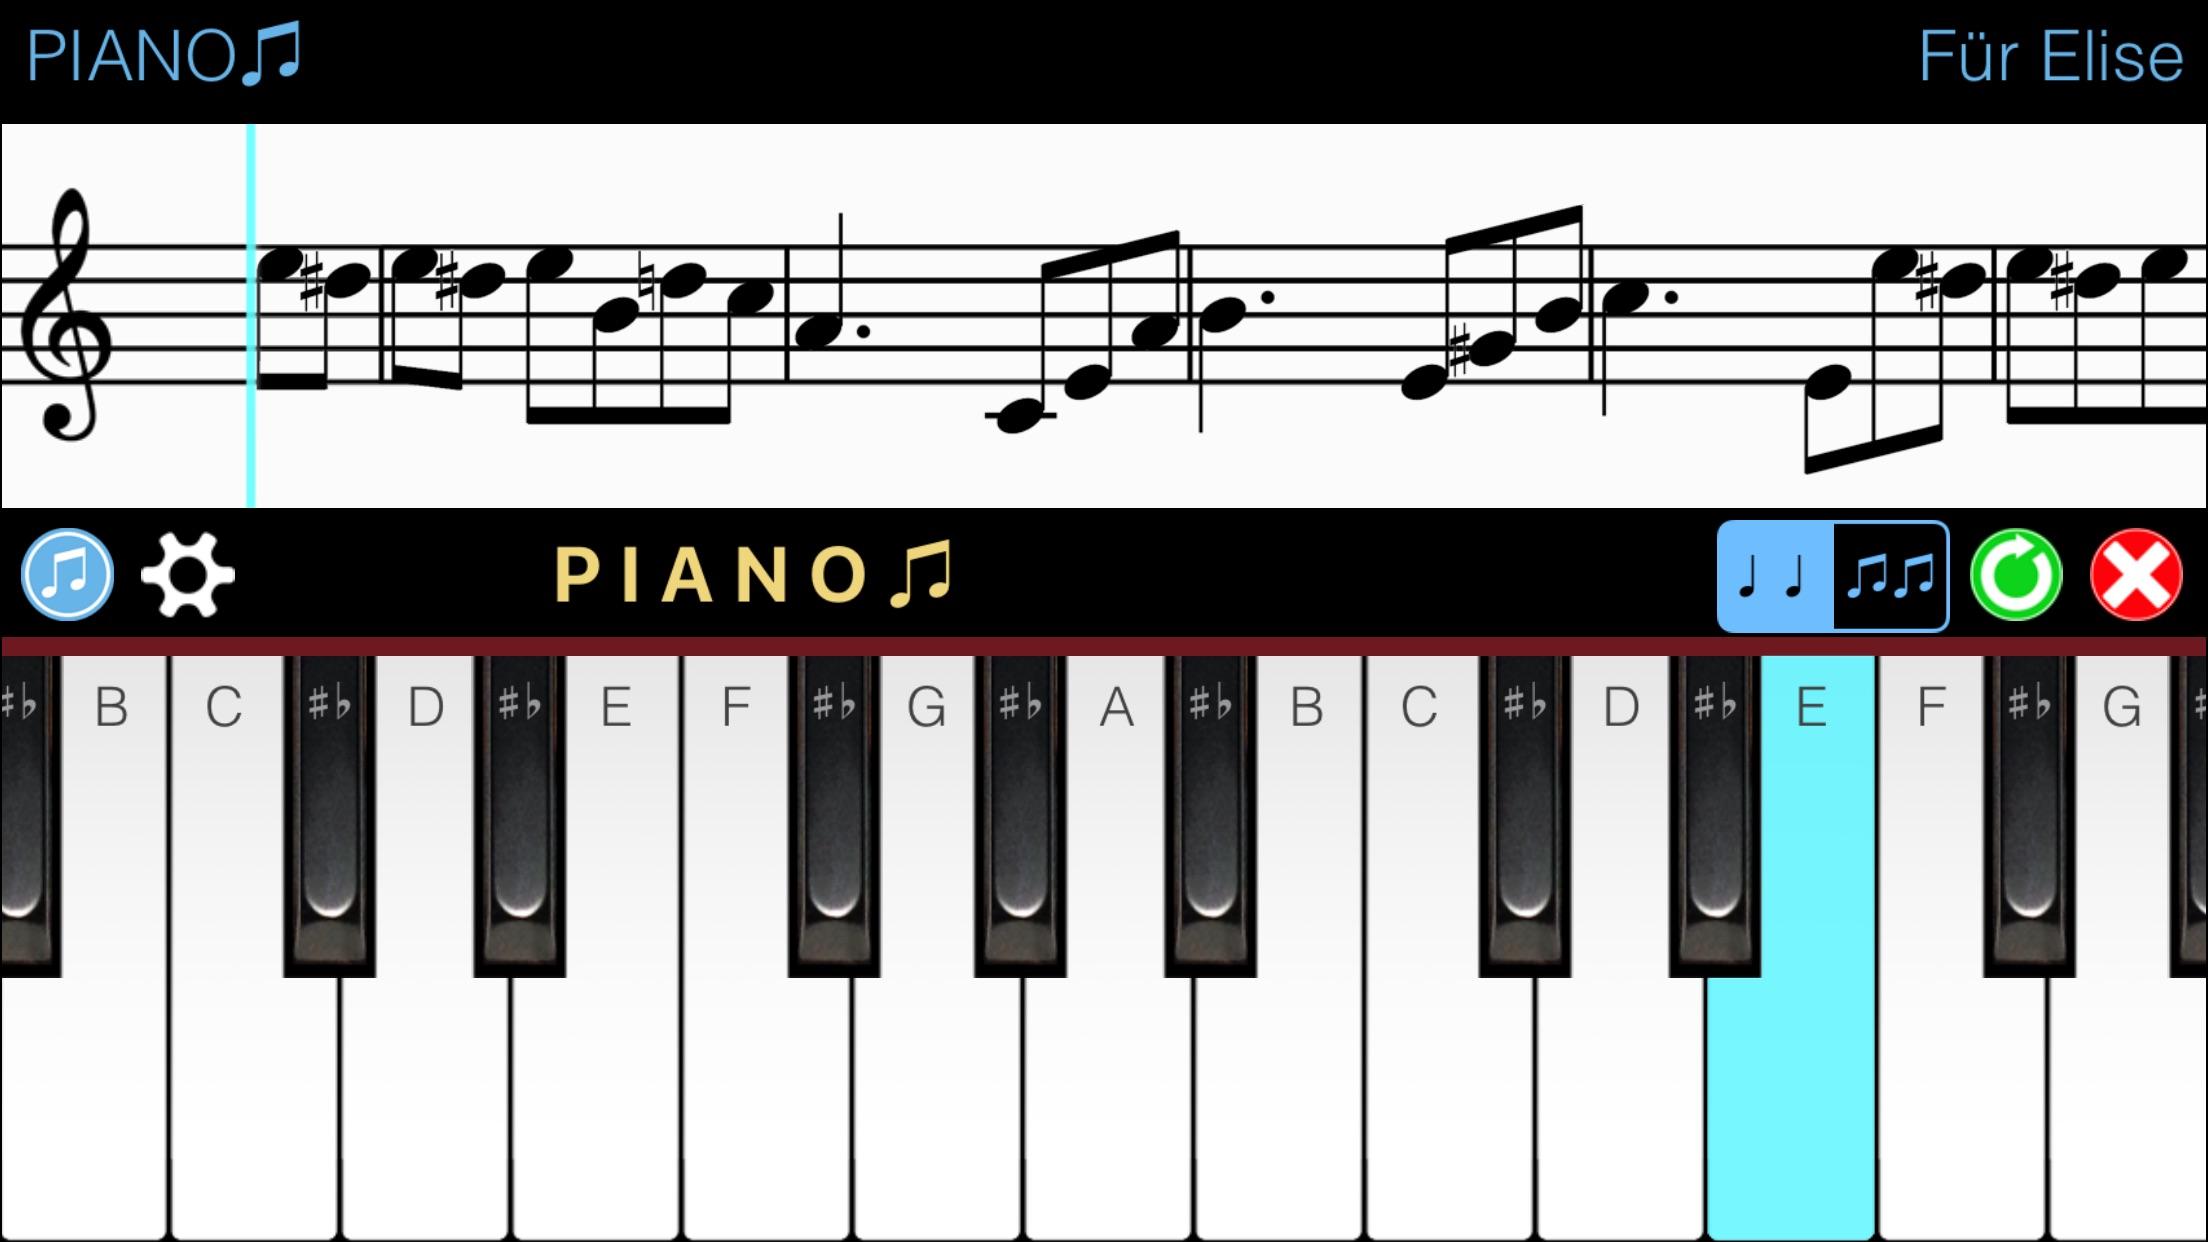 Piano... Screenshot